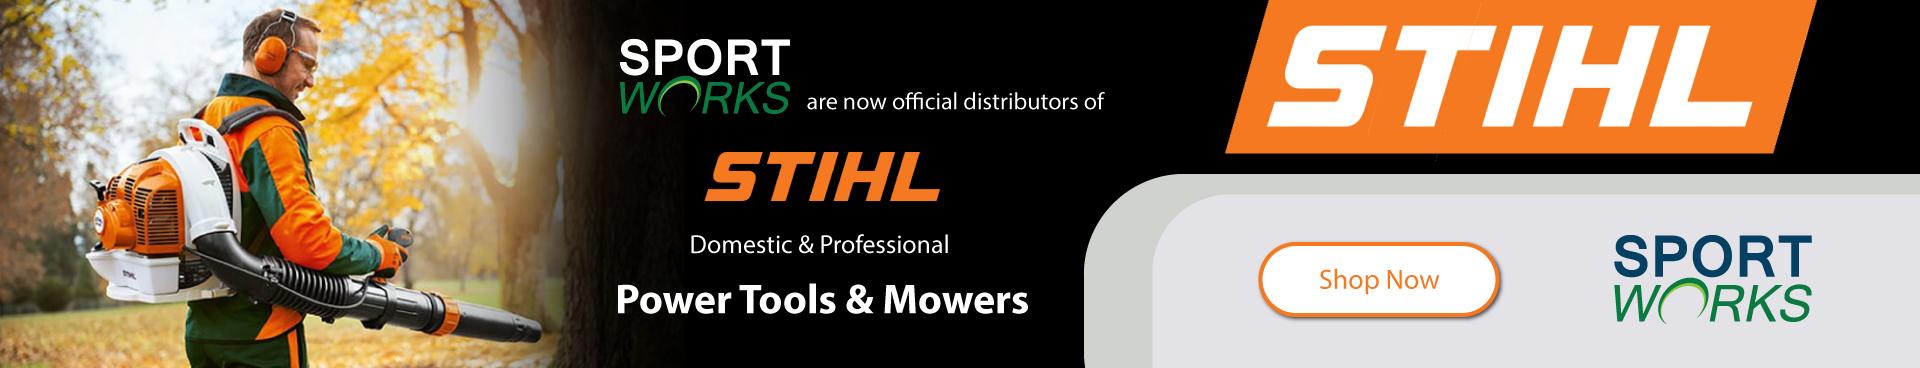 STIHL official distributors banner image